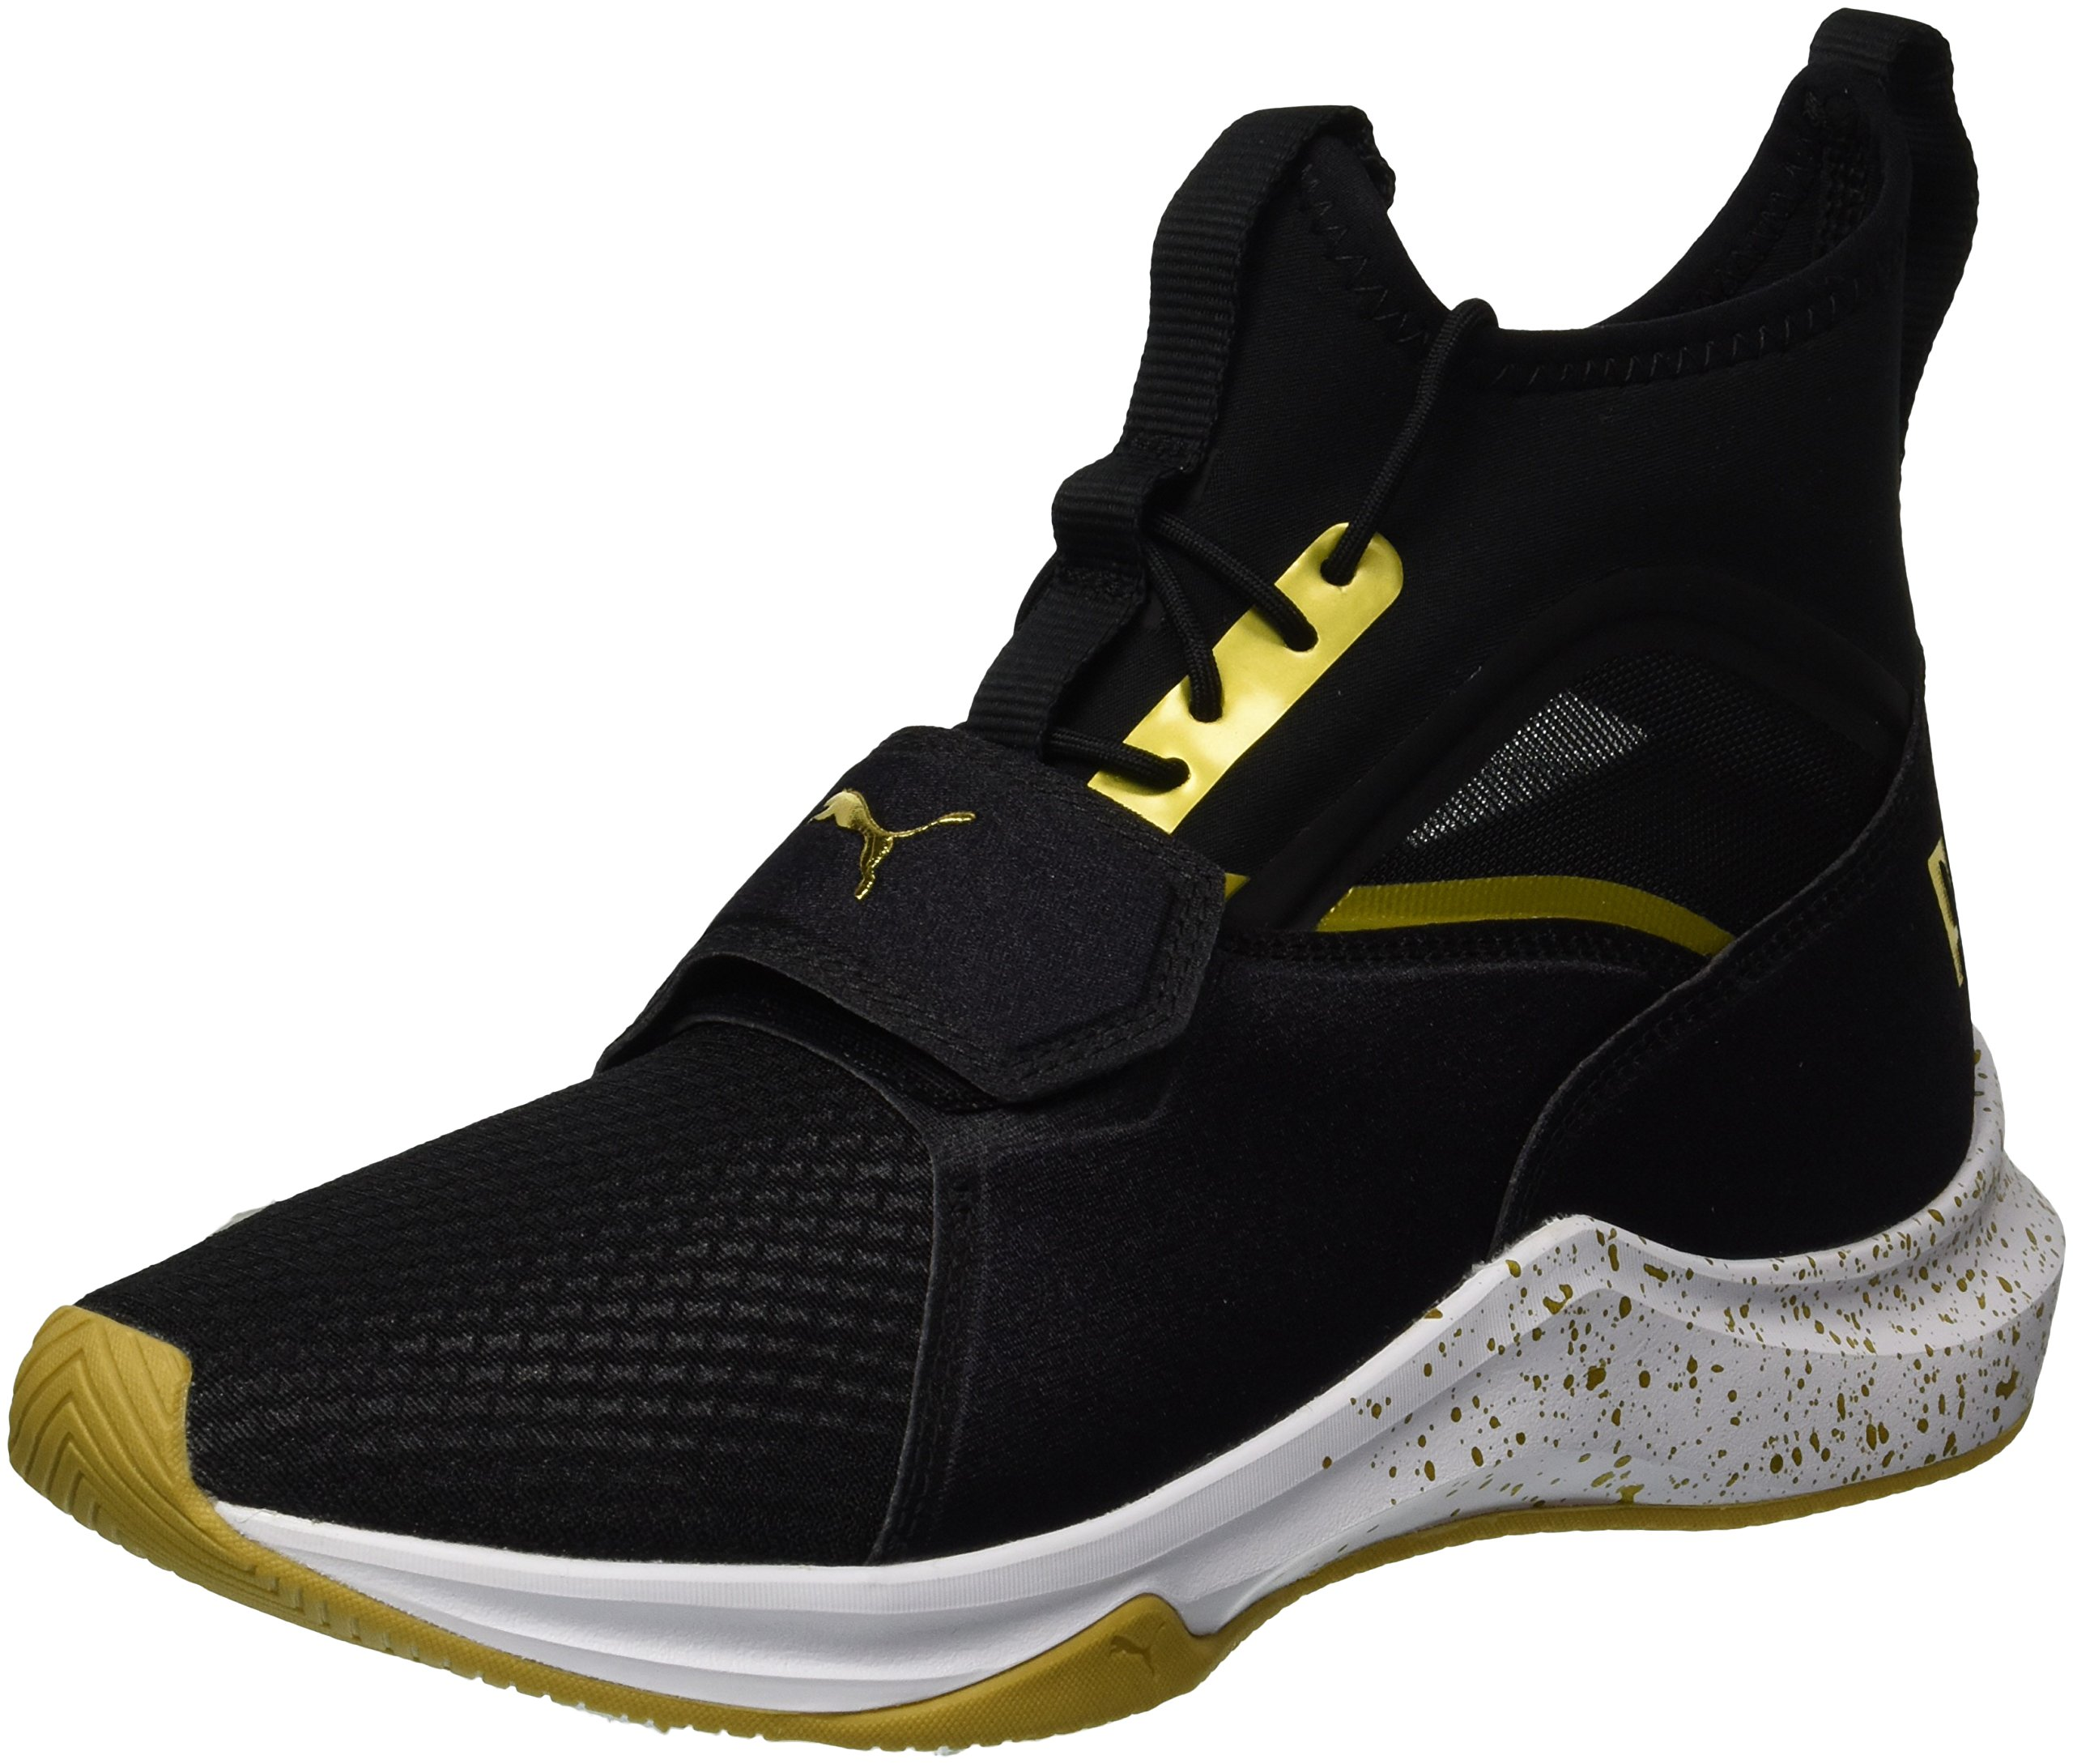 PUMA Women's Phenom Gold Wn Sneaker, Black Team Gold, 9.5 M US